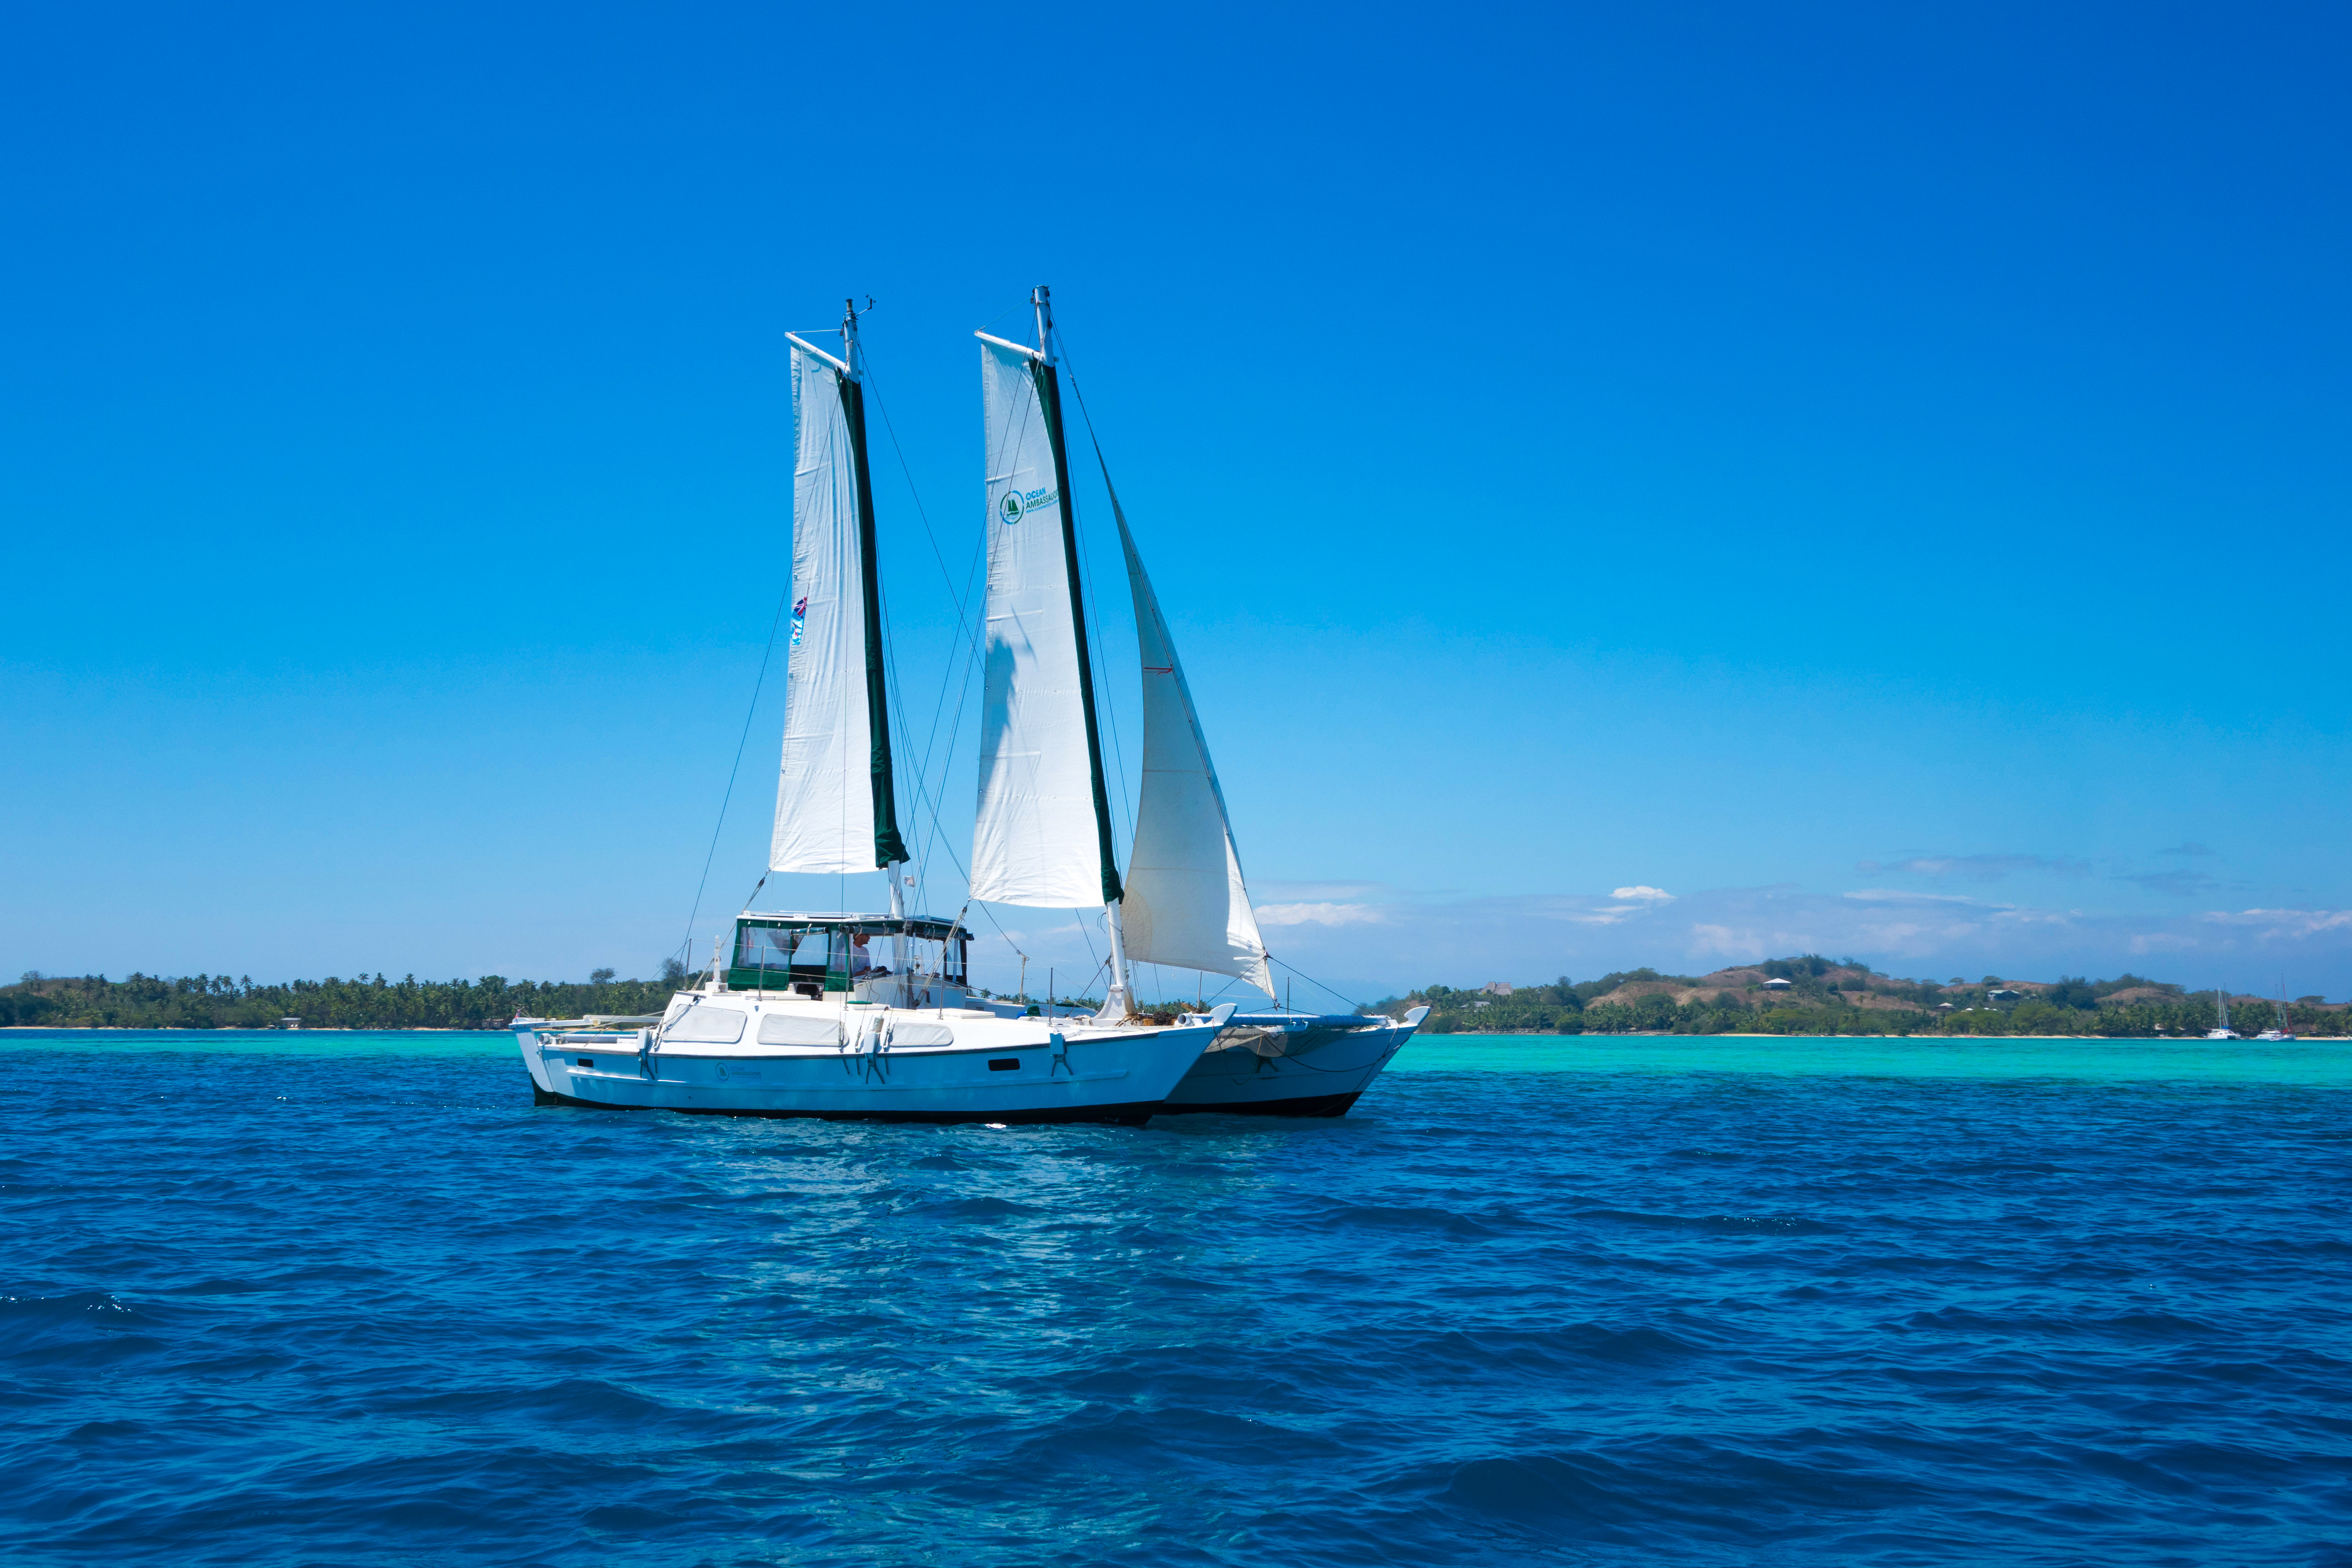 Moana_Sailing_Fiji_Wharram